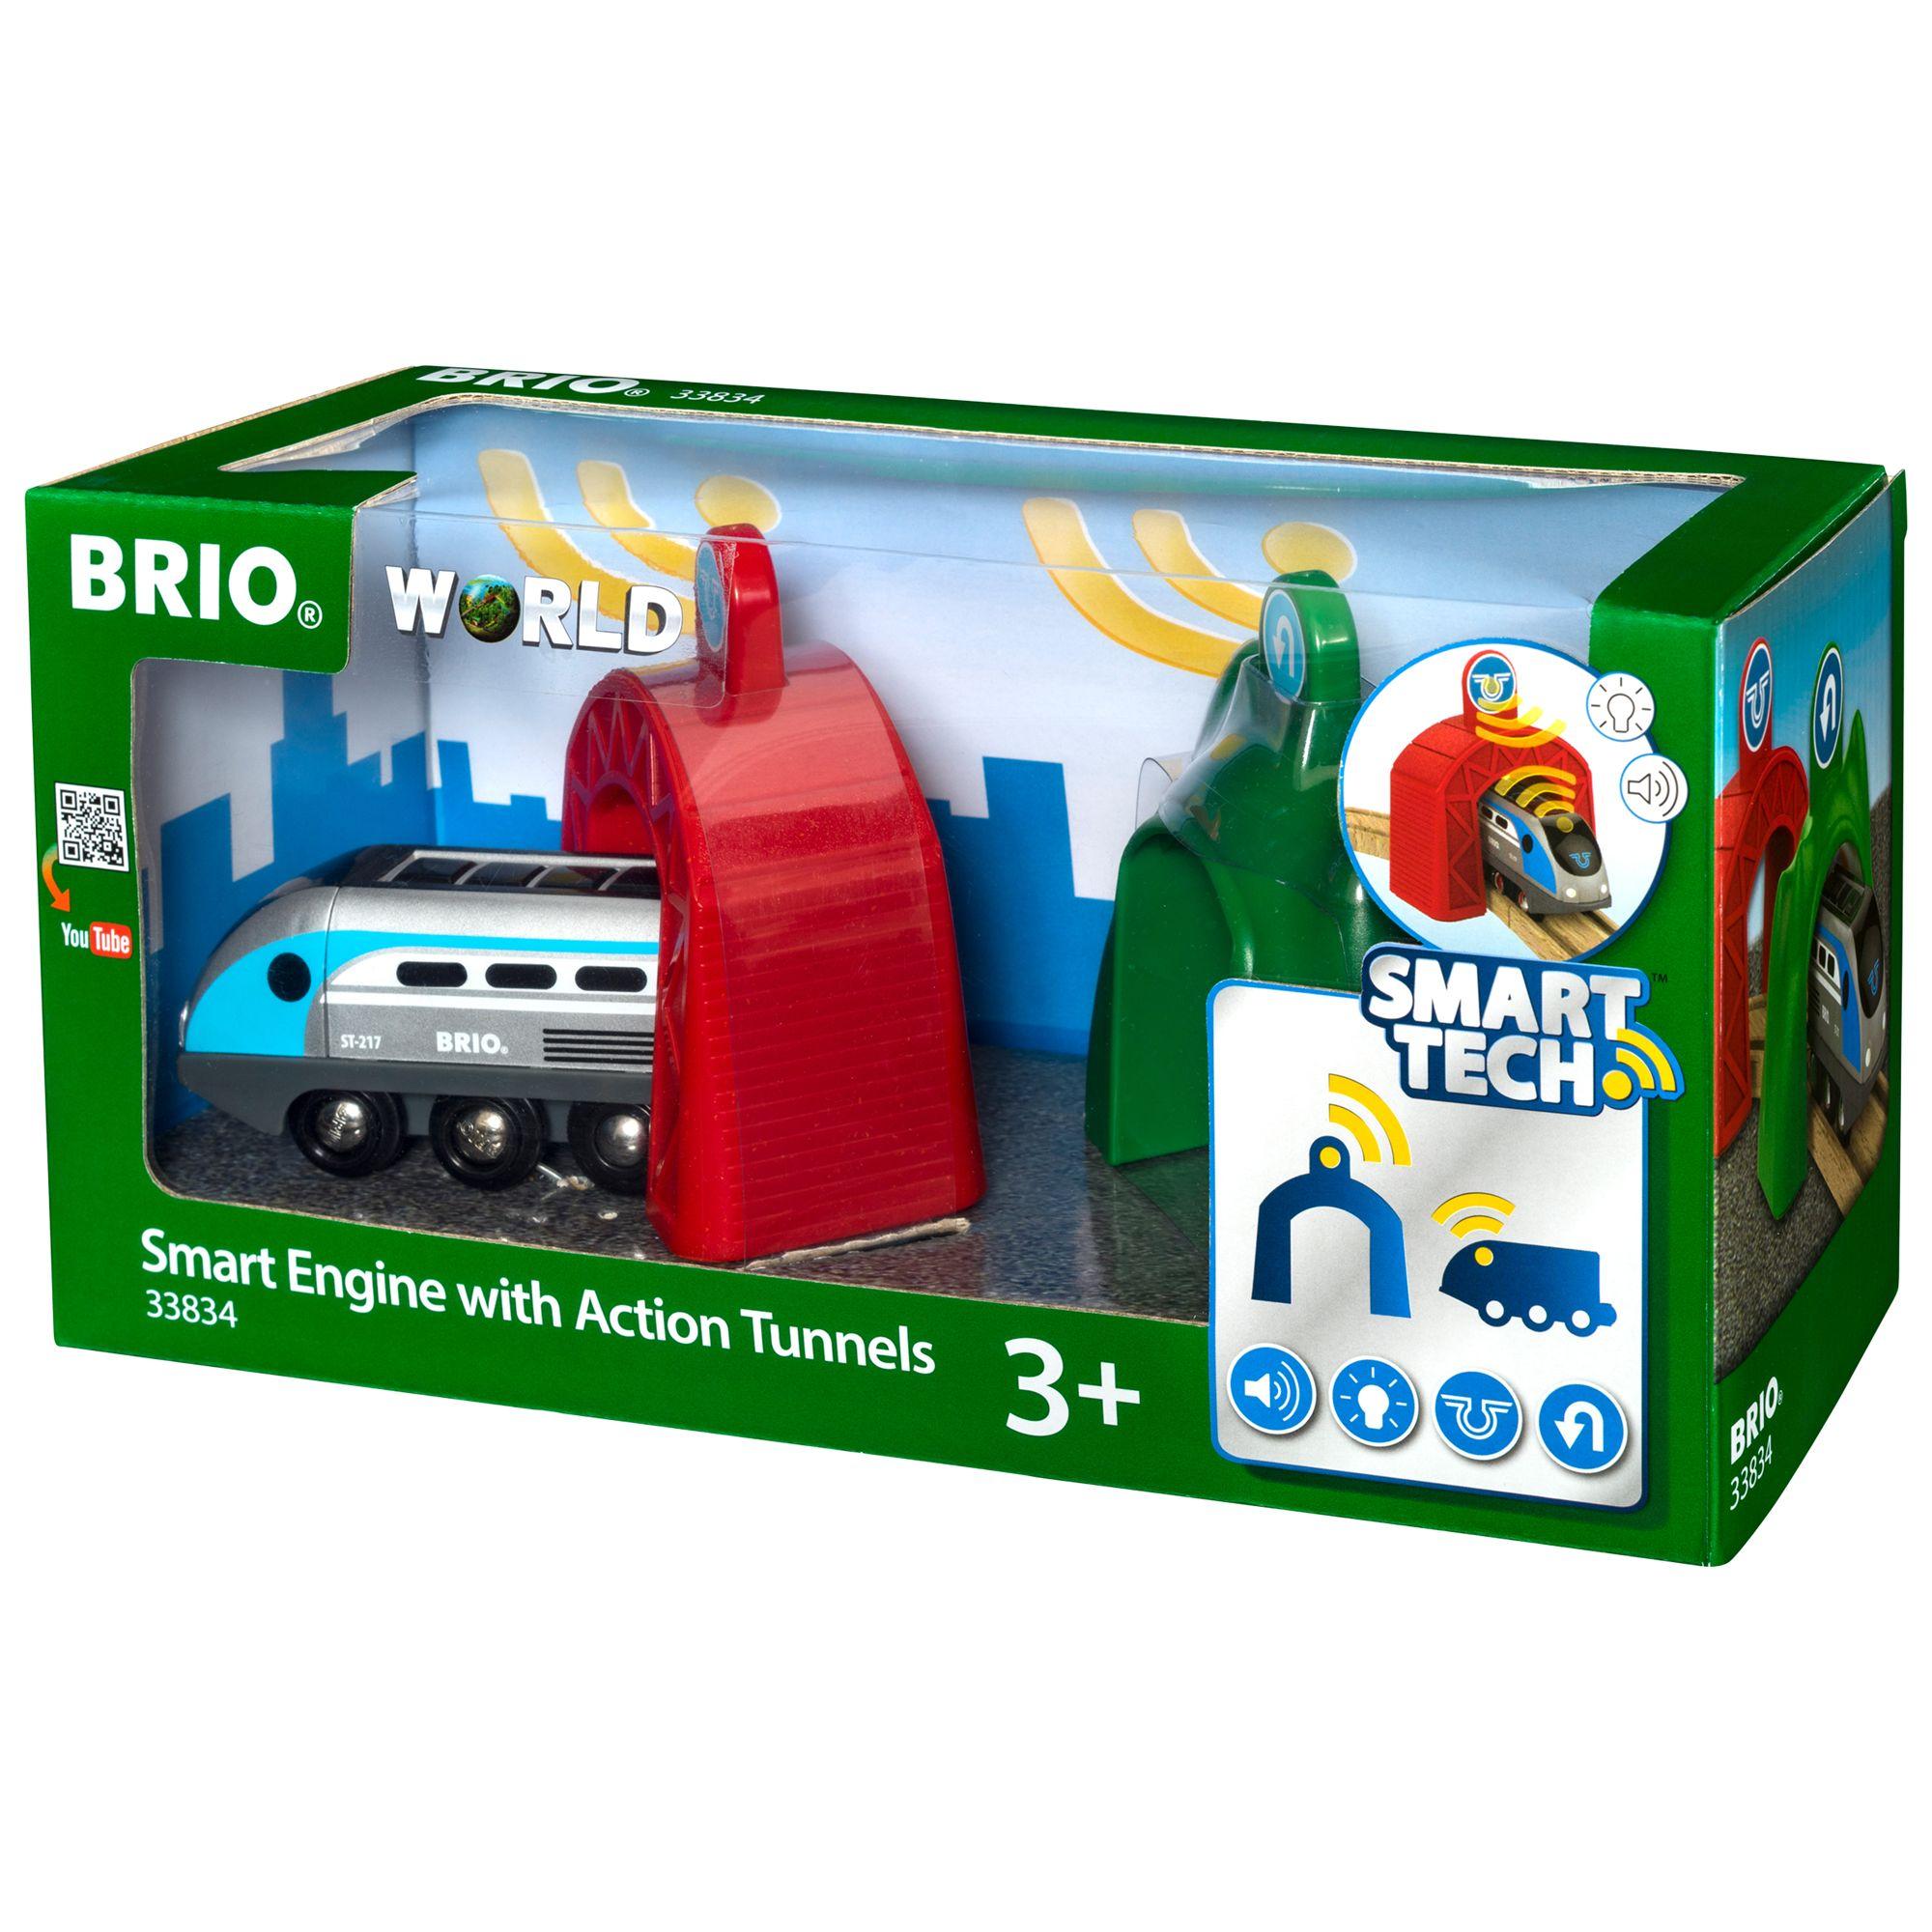 BRIO BRIO World Smart Tech Engine with Action Tunnels